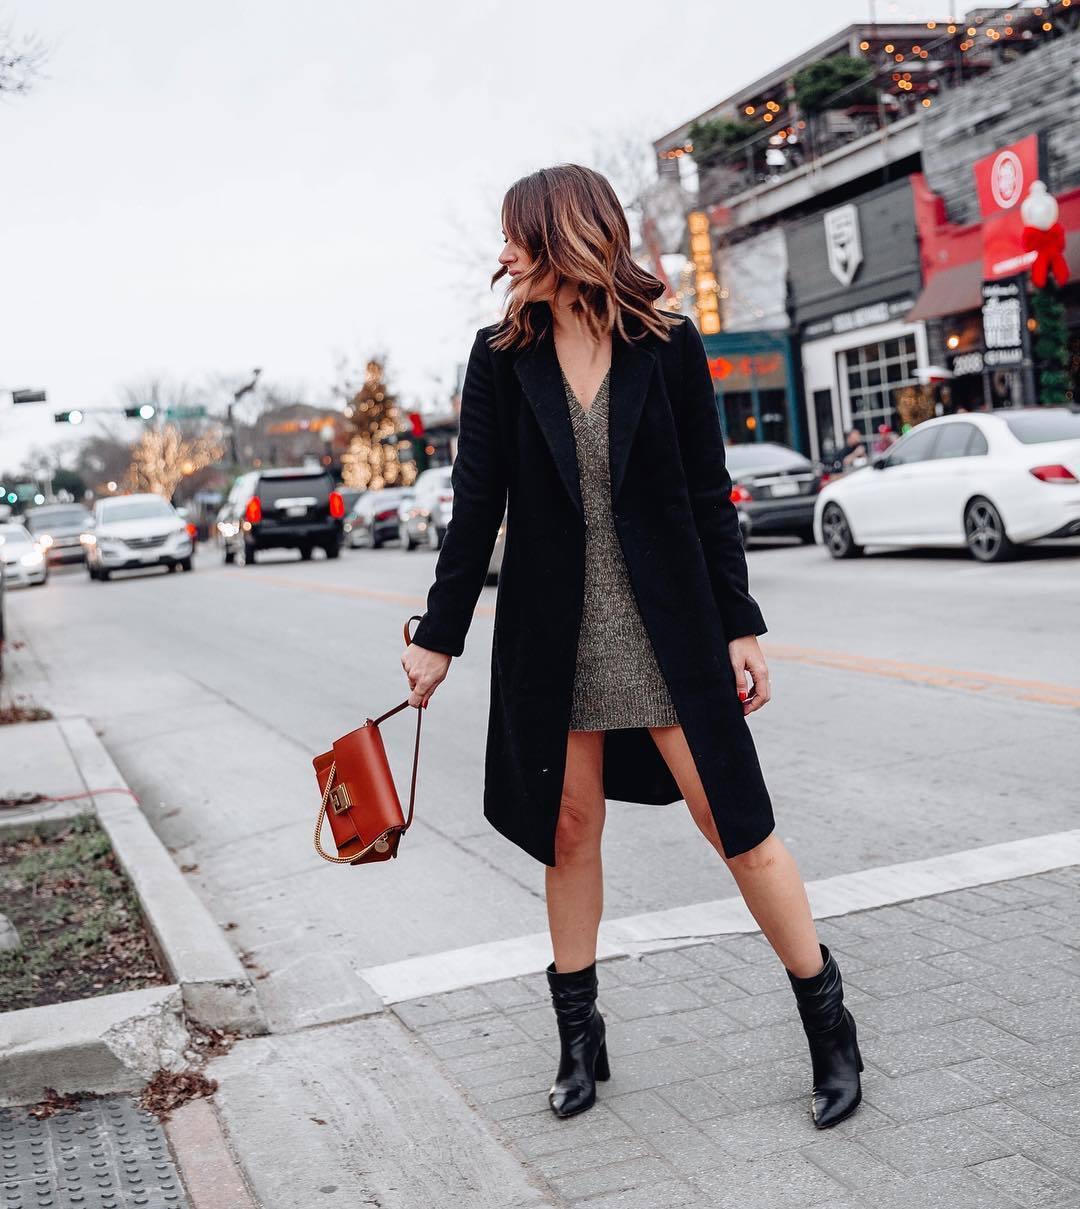 bag givenchy bag black bag heel boots v neck dress mini dress black coat long coat